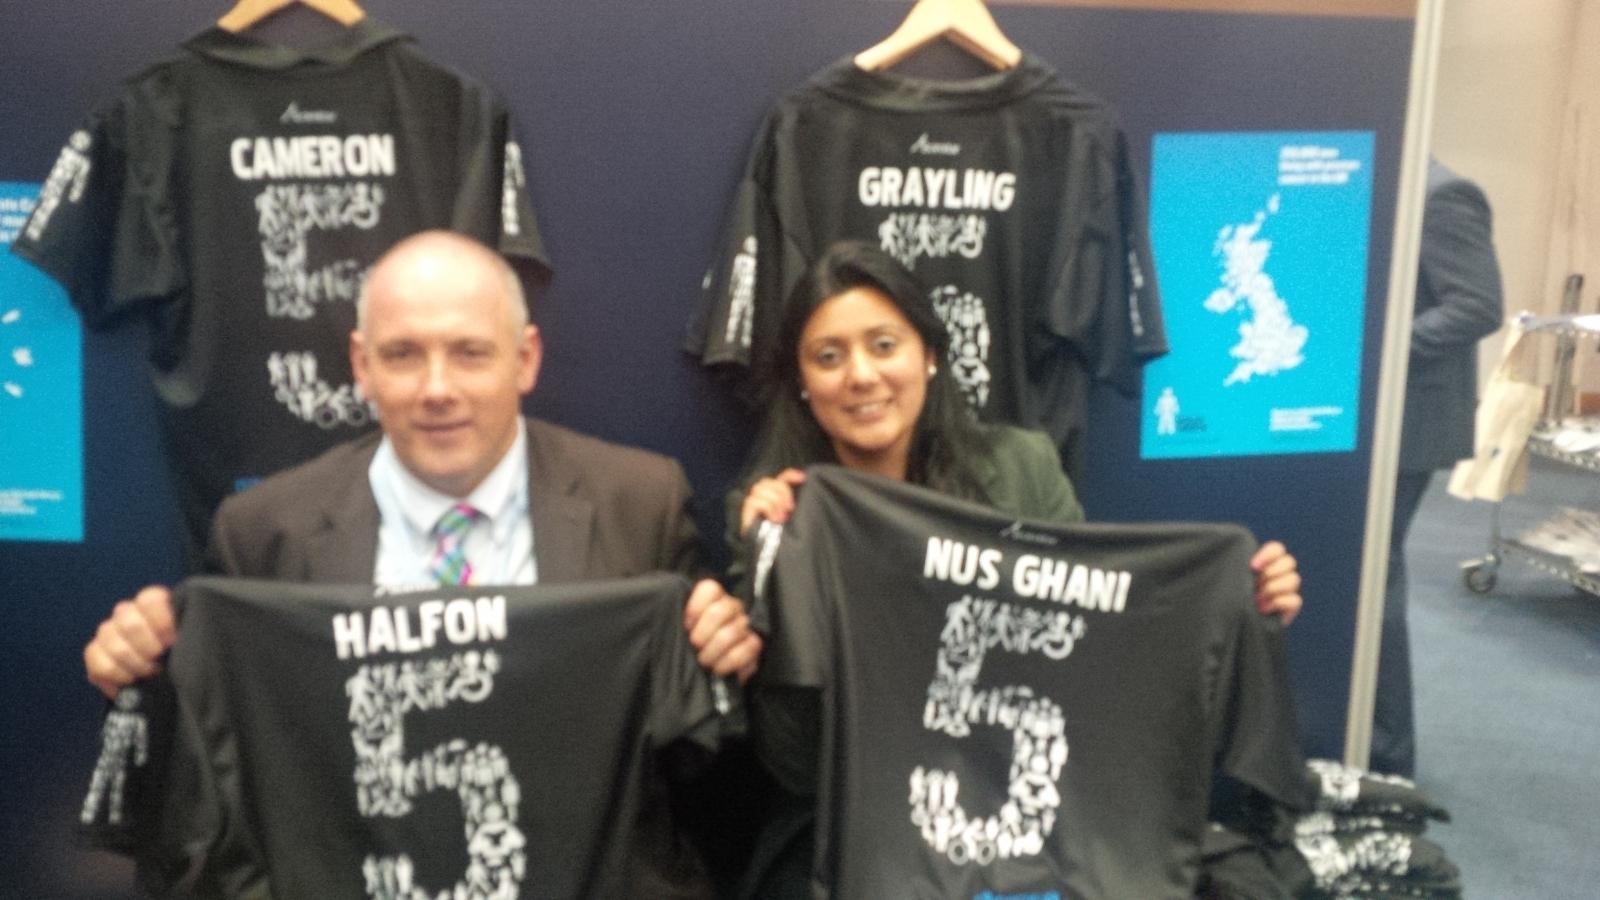 Nus Ghani and Rob Halfon MP